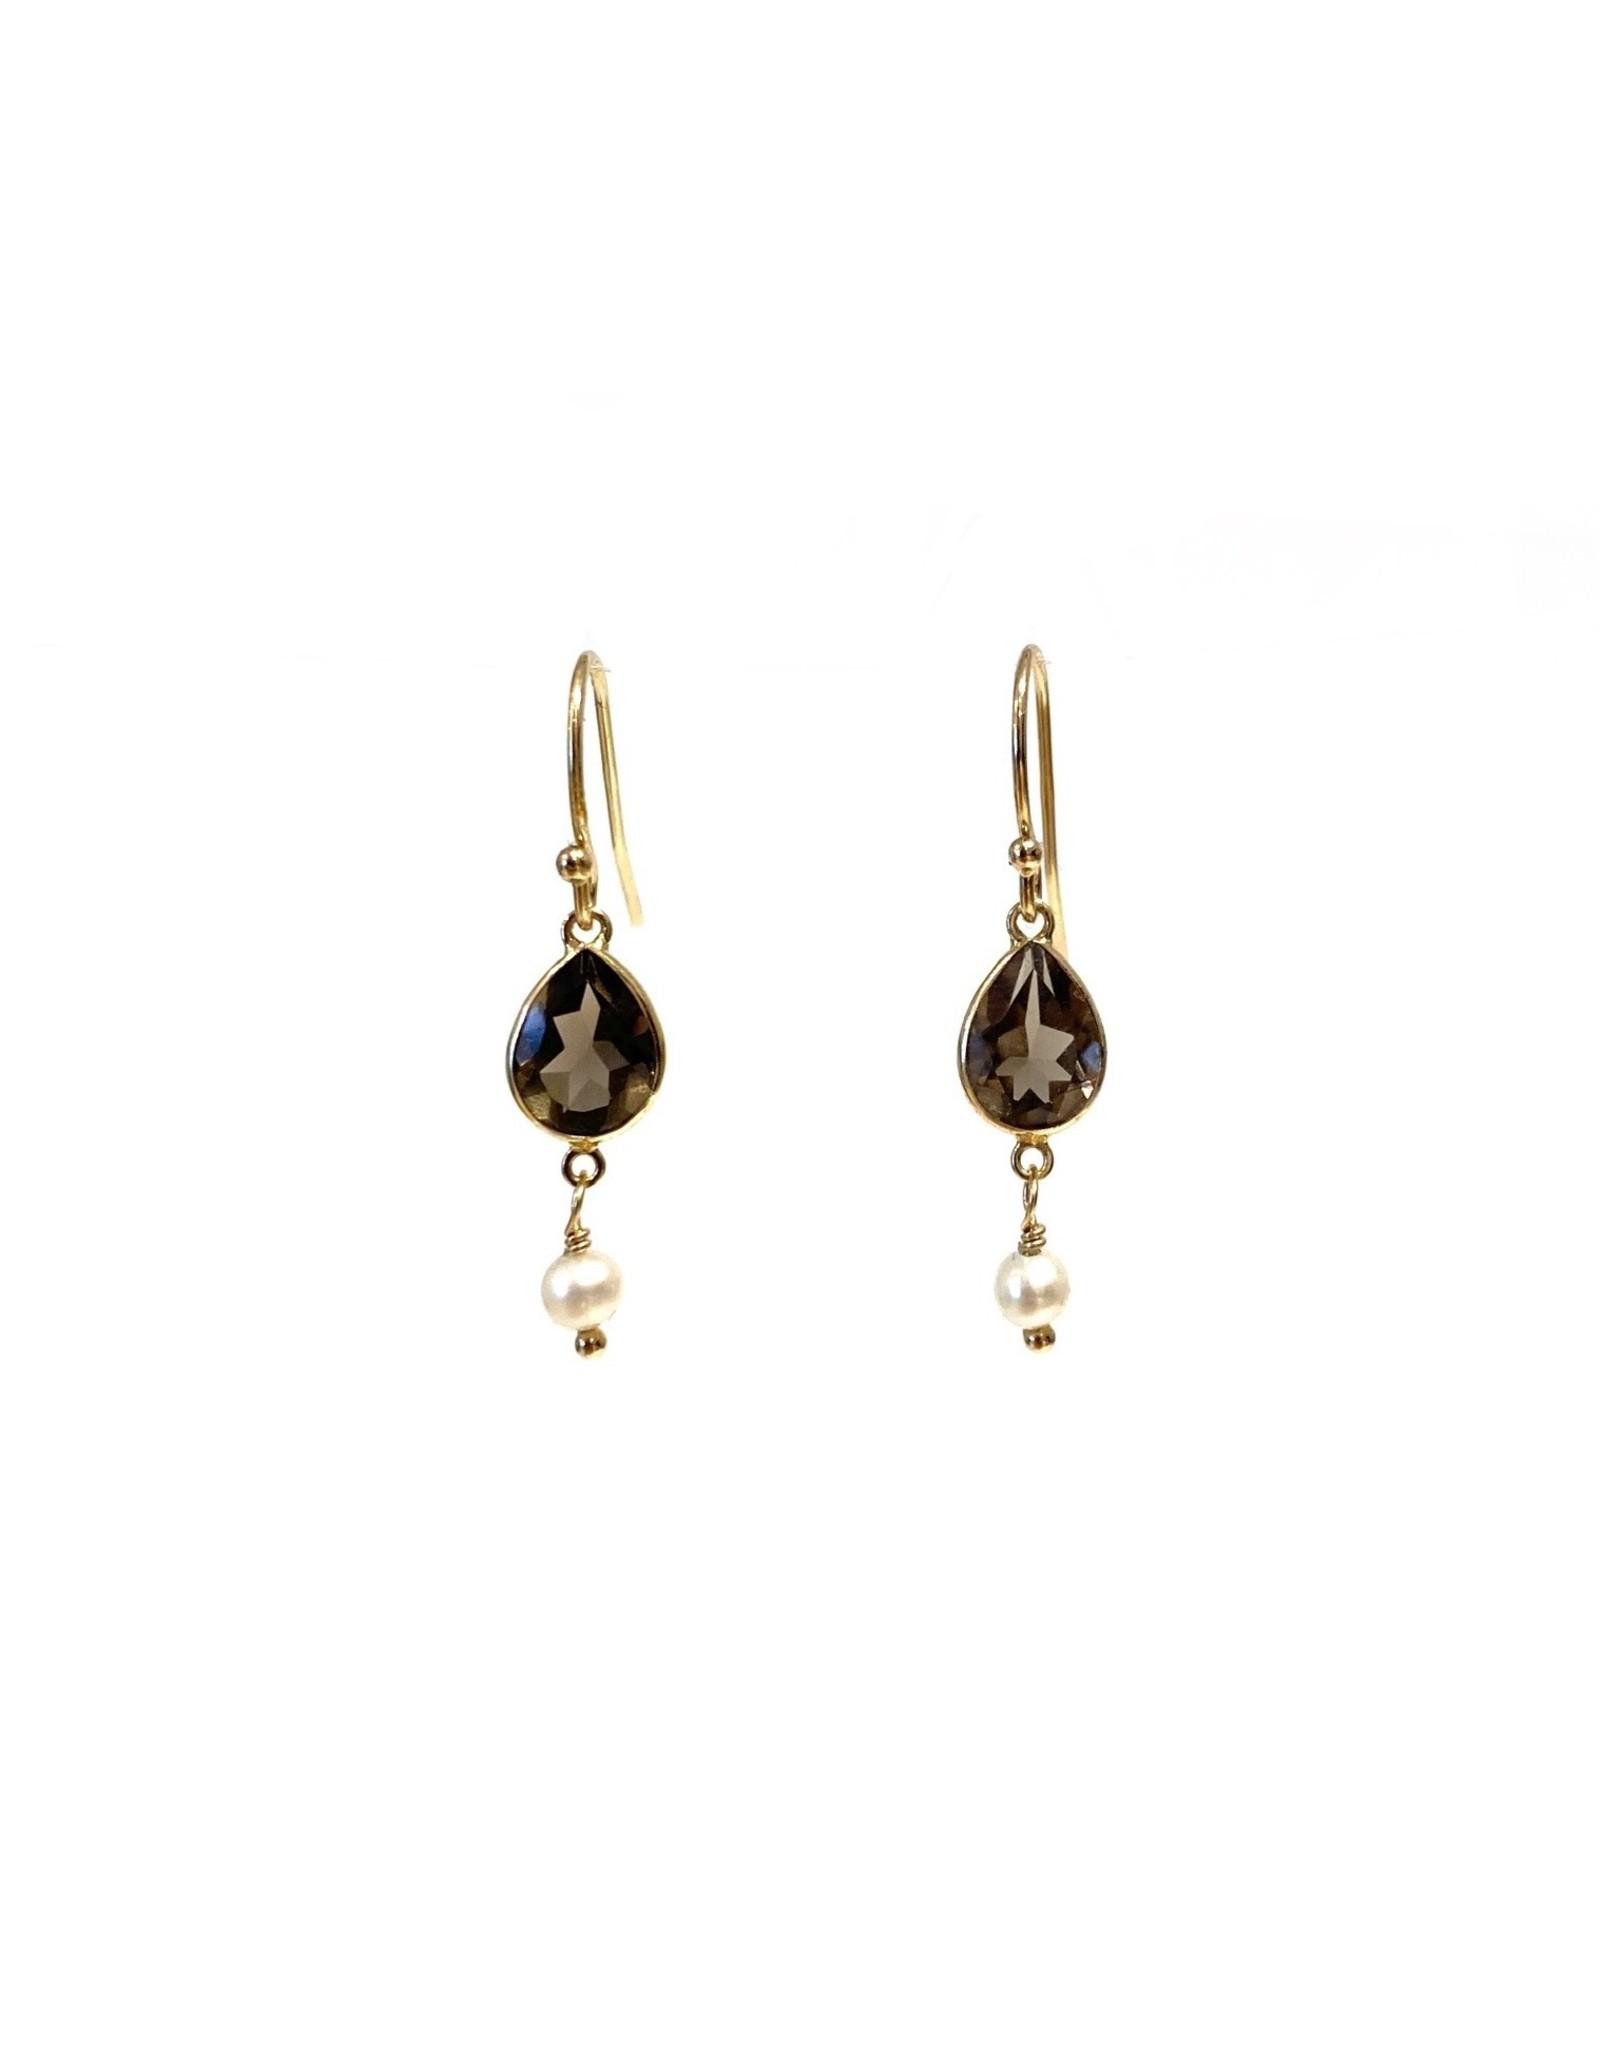 Bo Gold Earrings - Gold - Smokey Quartz